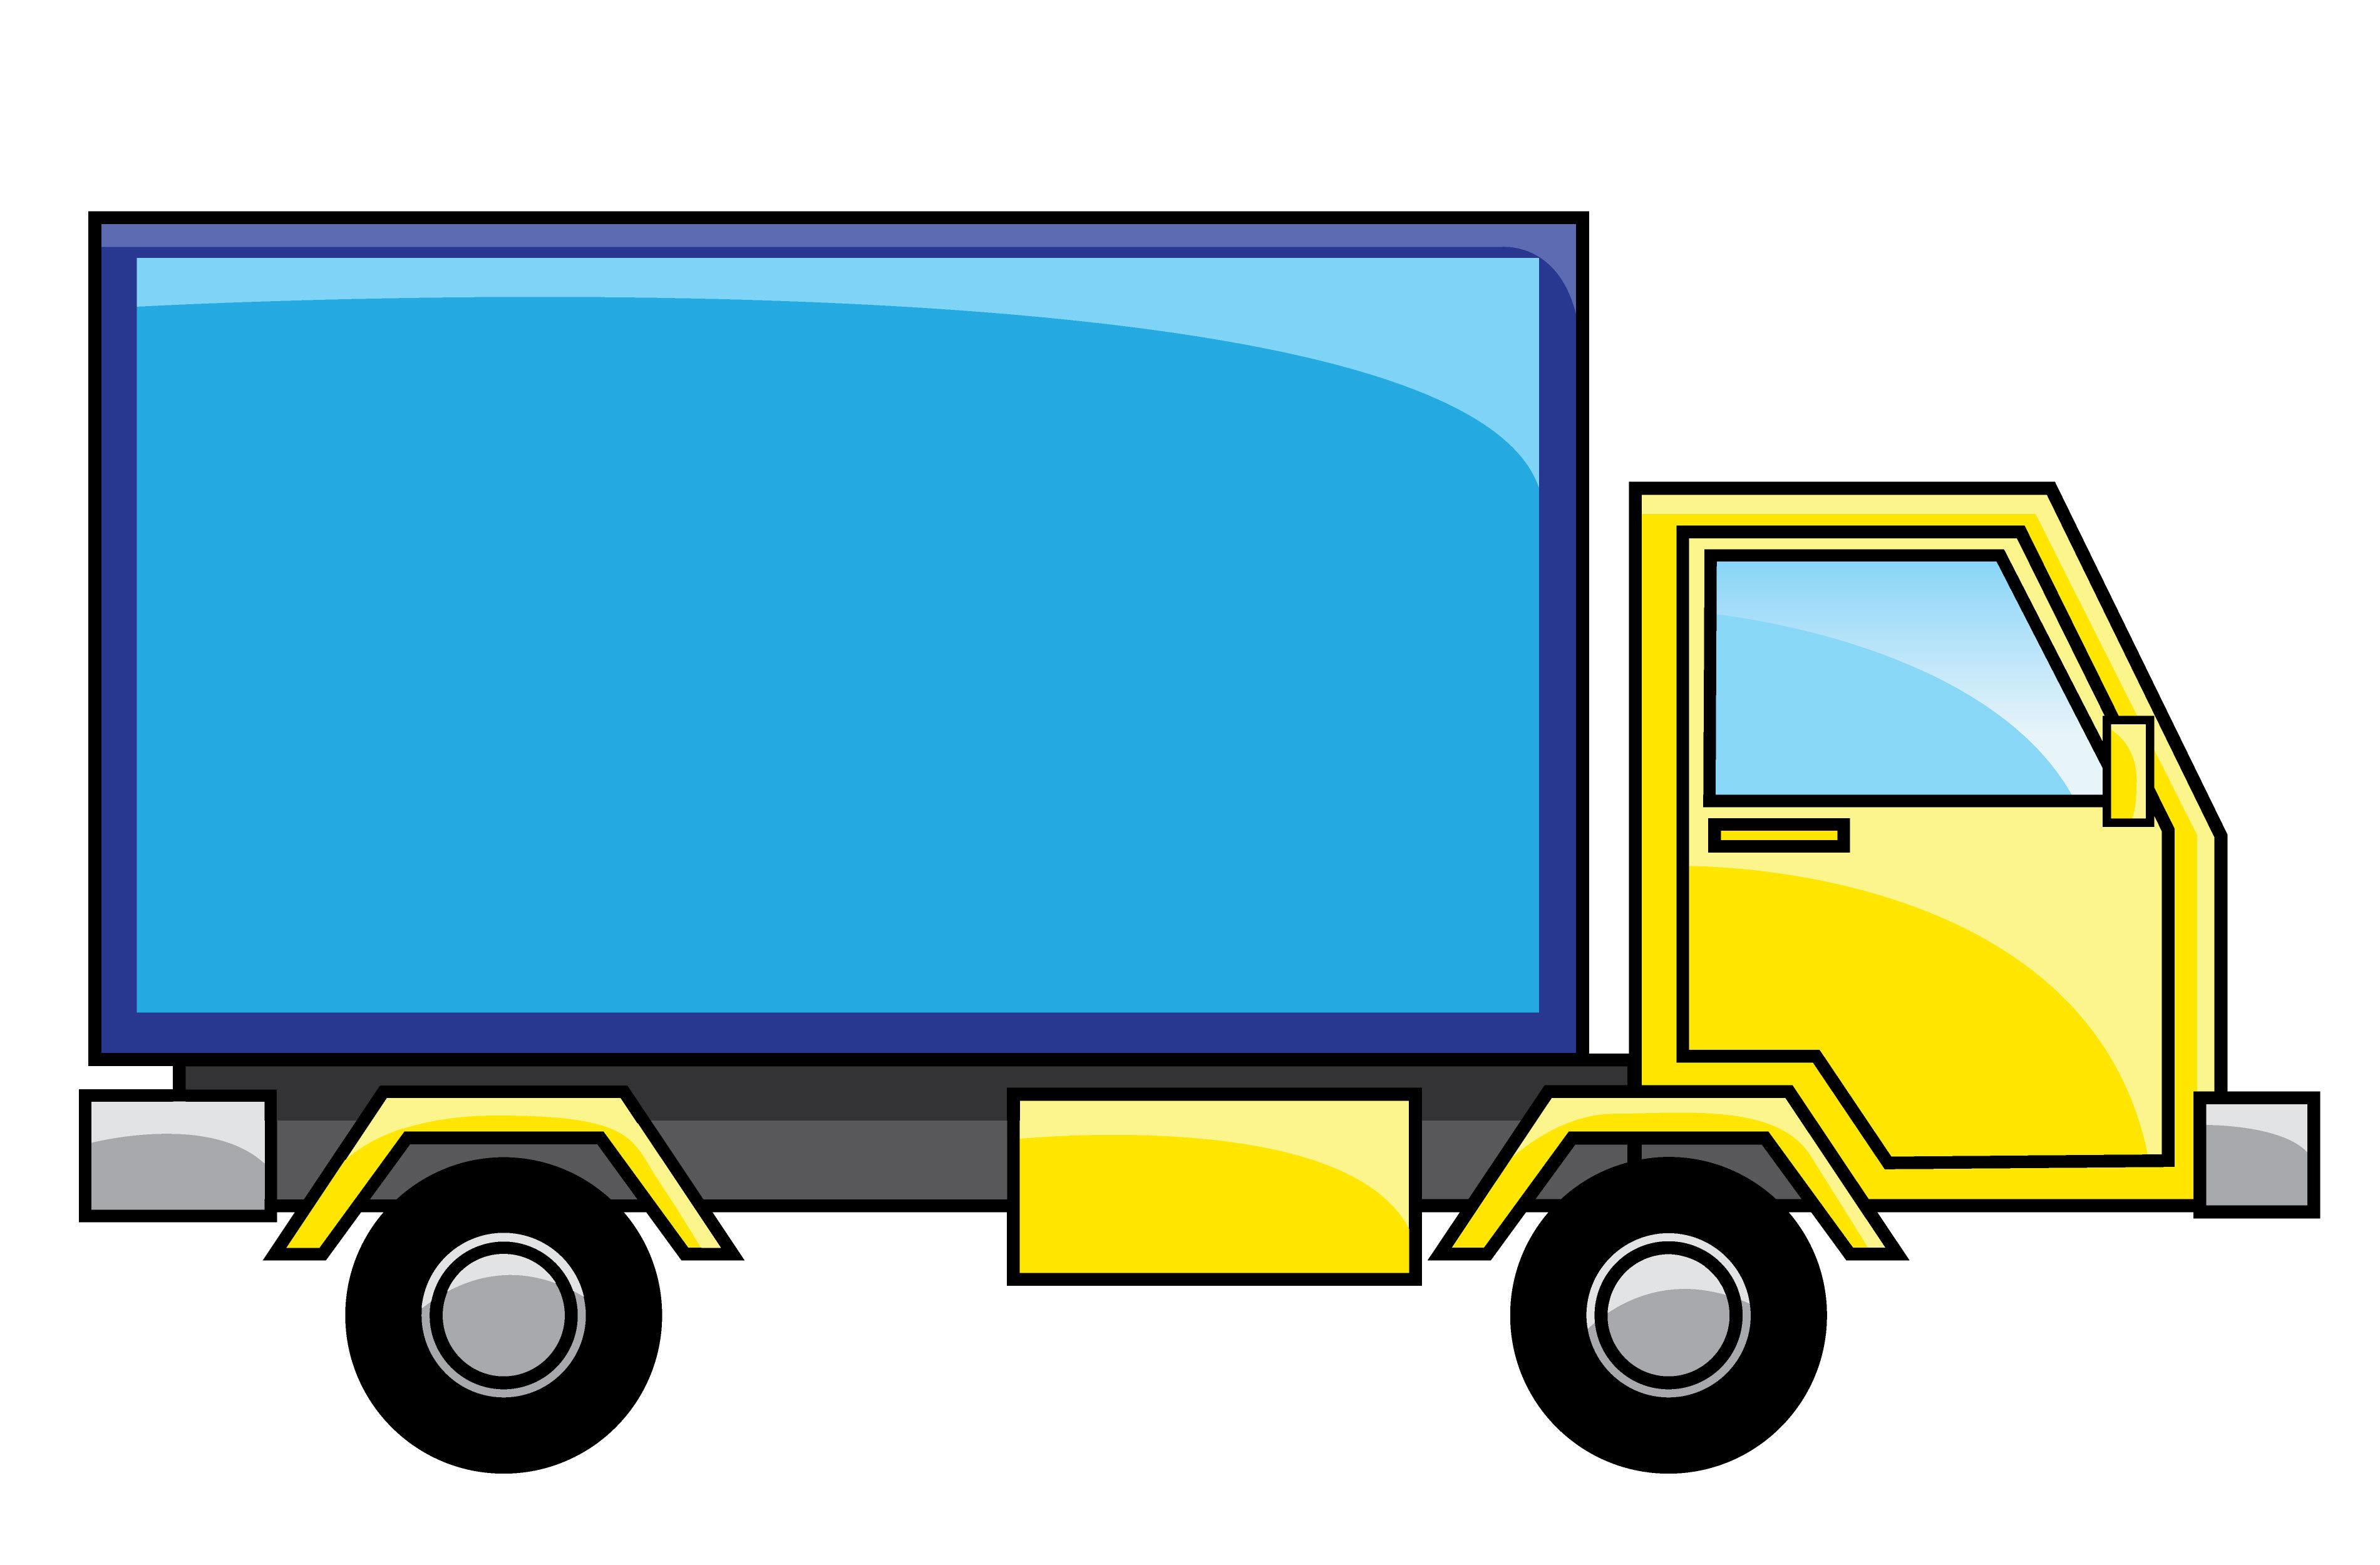 Fedex clipart semi truck Truck Free 6 Clipart Clipartix